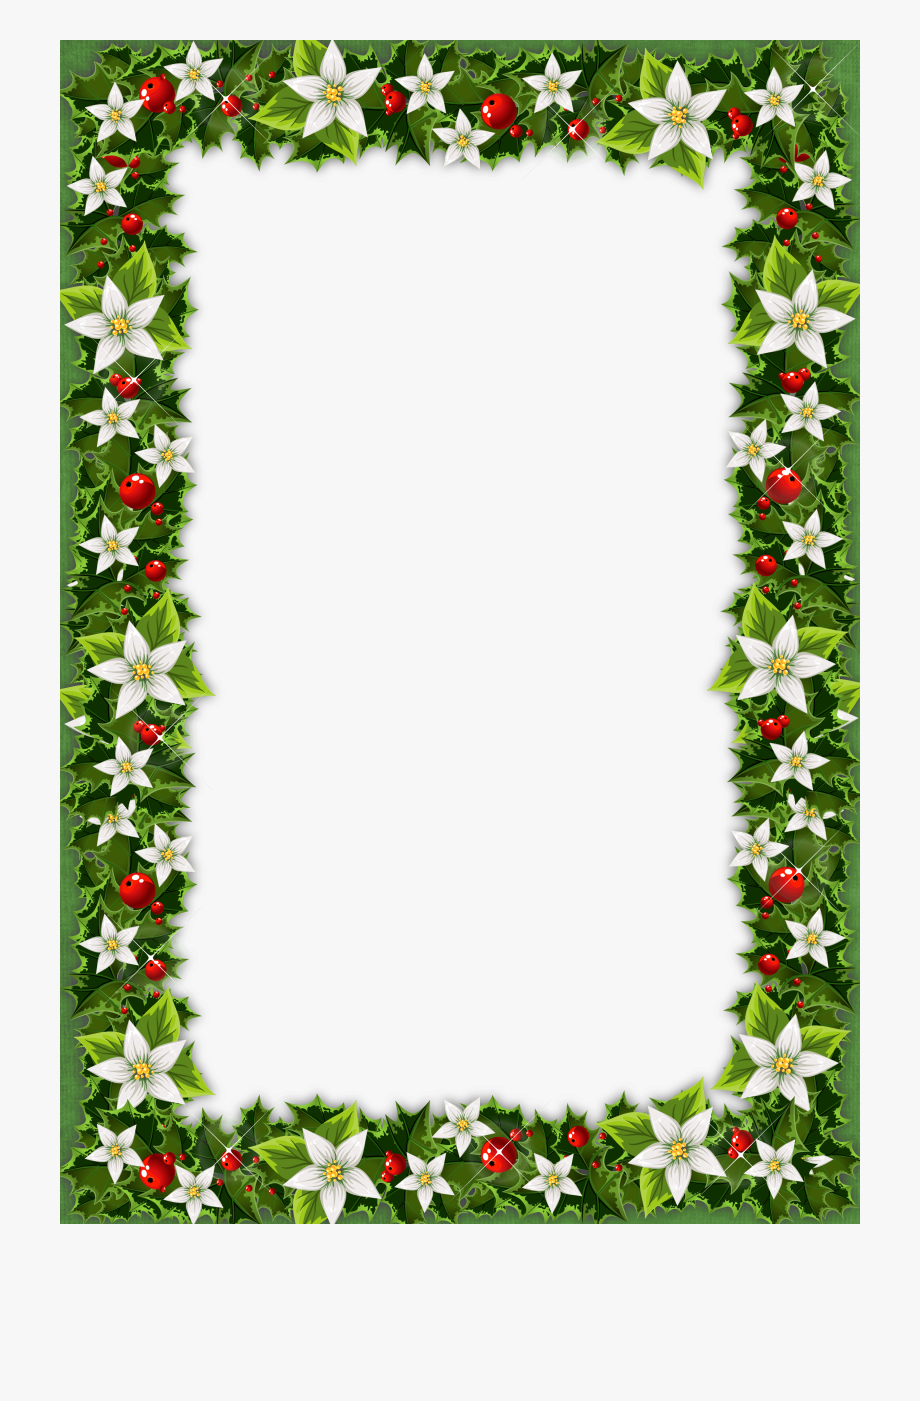 Free Christmas Vector Library Frames Techflourish.